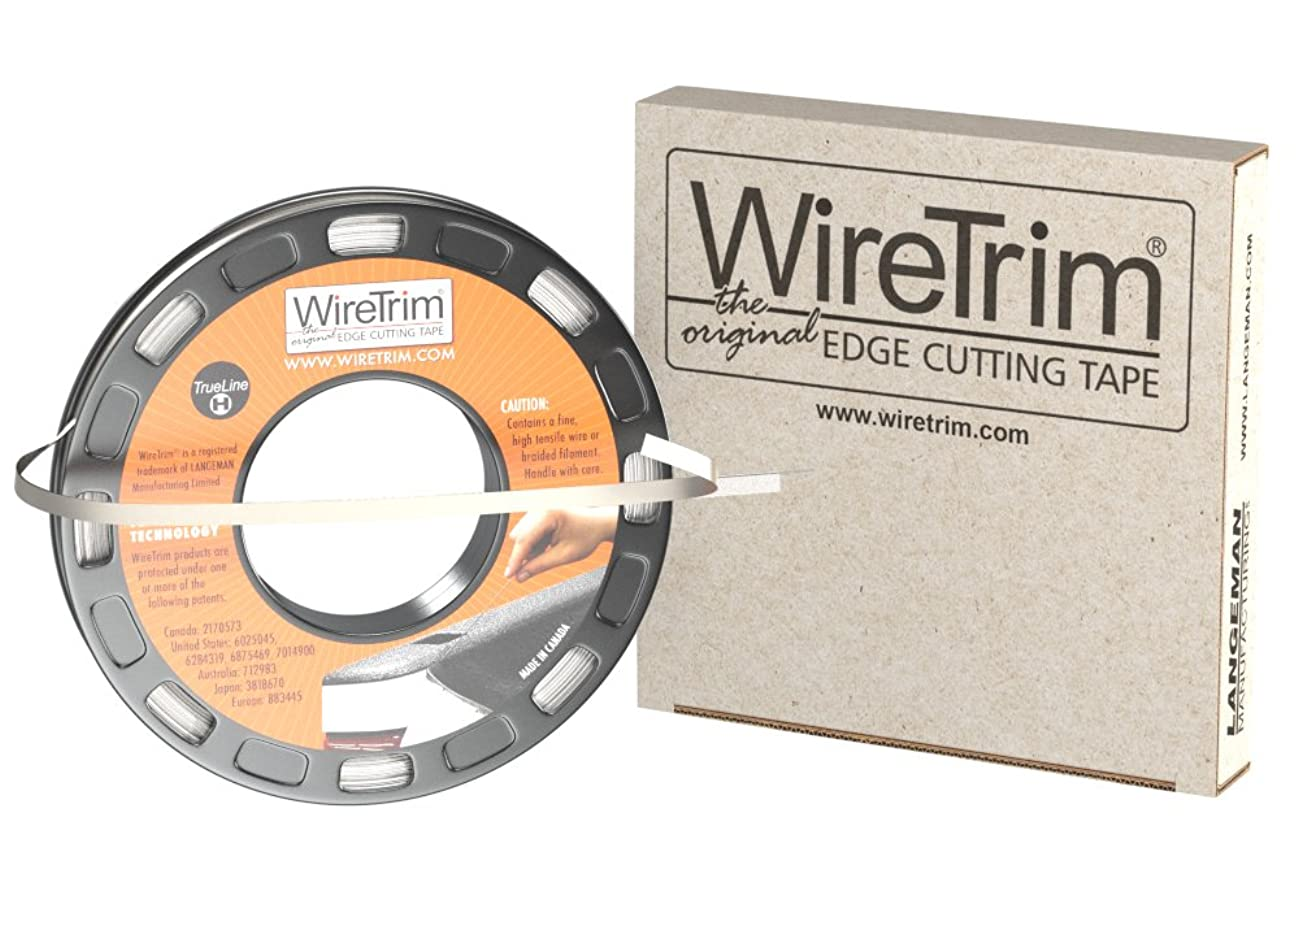 WireTrim, TrueLine (Heavy Duty), Edge Cutting Tape, 1/4-Inch X 100 Feet, 1 Roll, 883662001208